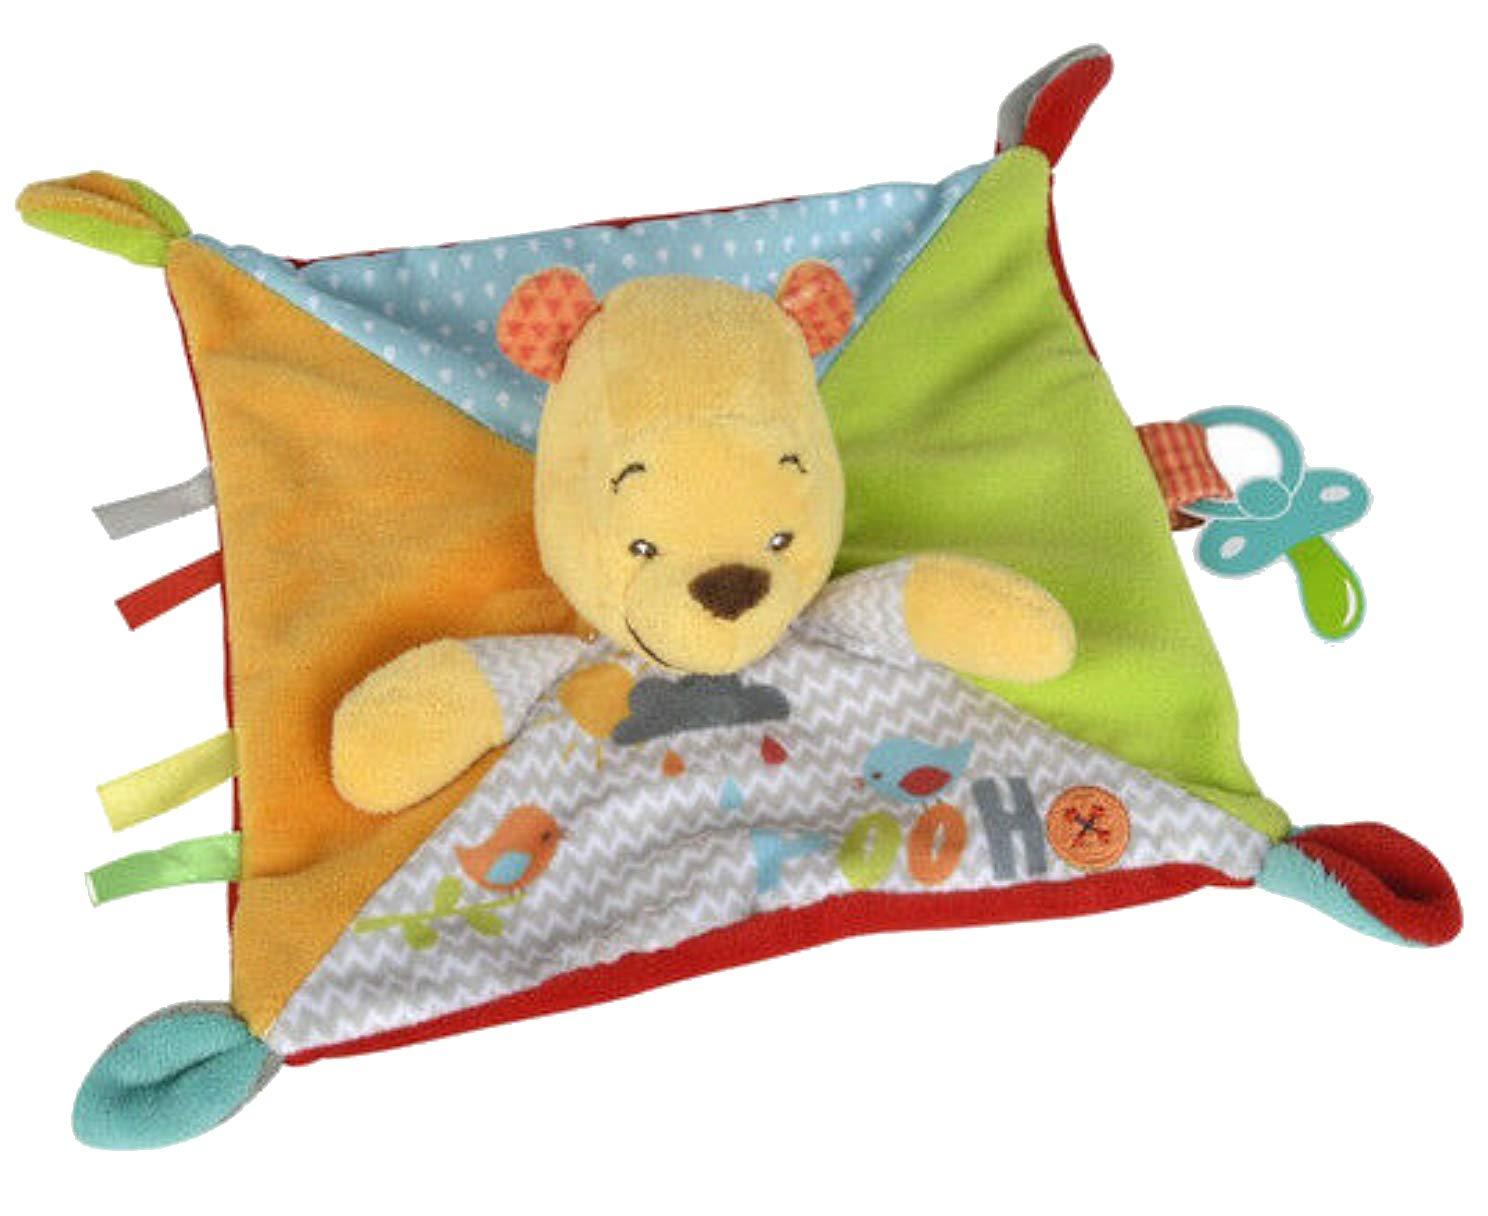 Disney - Doudou Disney Winnie the pooh plat orange pluie attache tetine oiseau wonderland - 8356